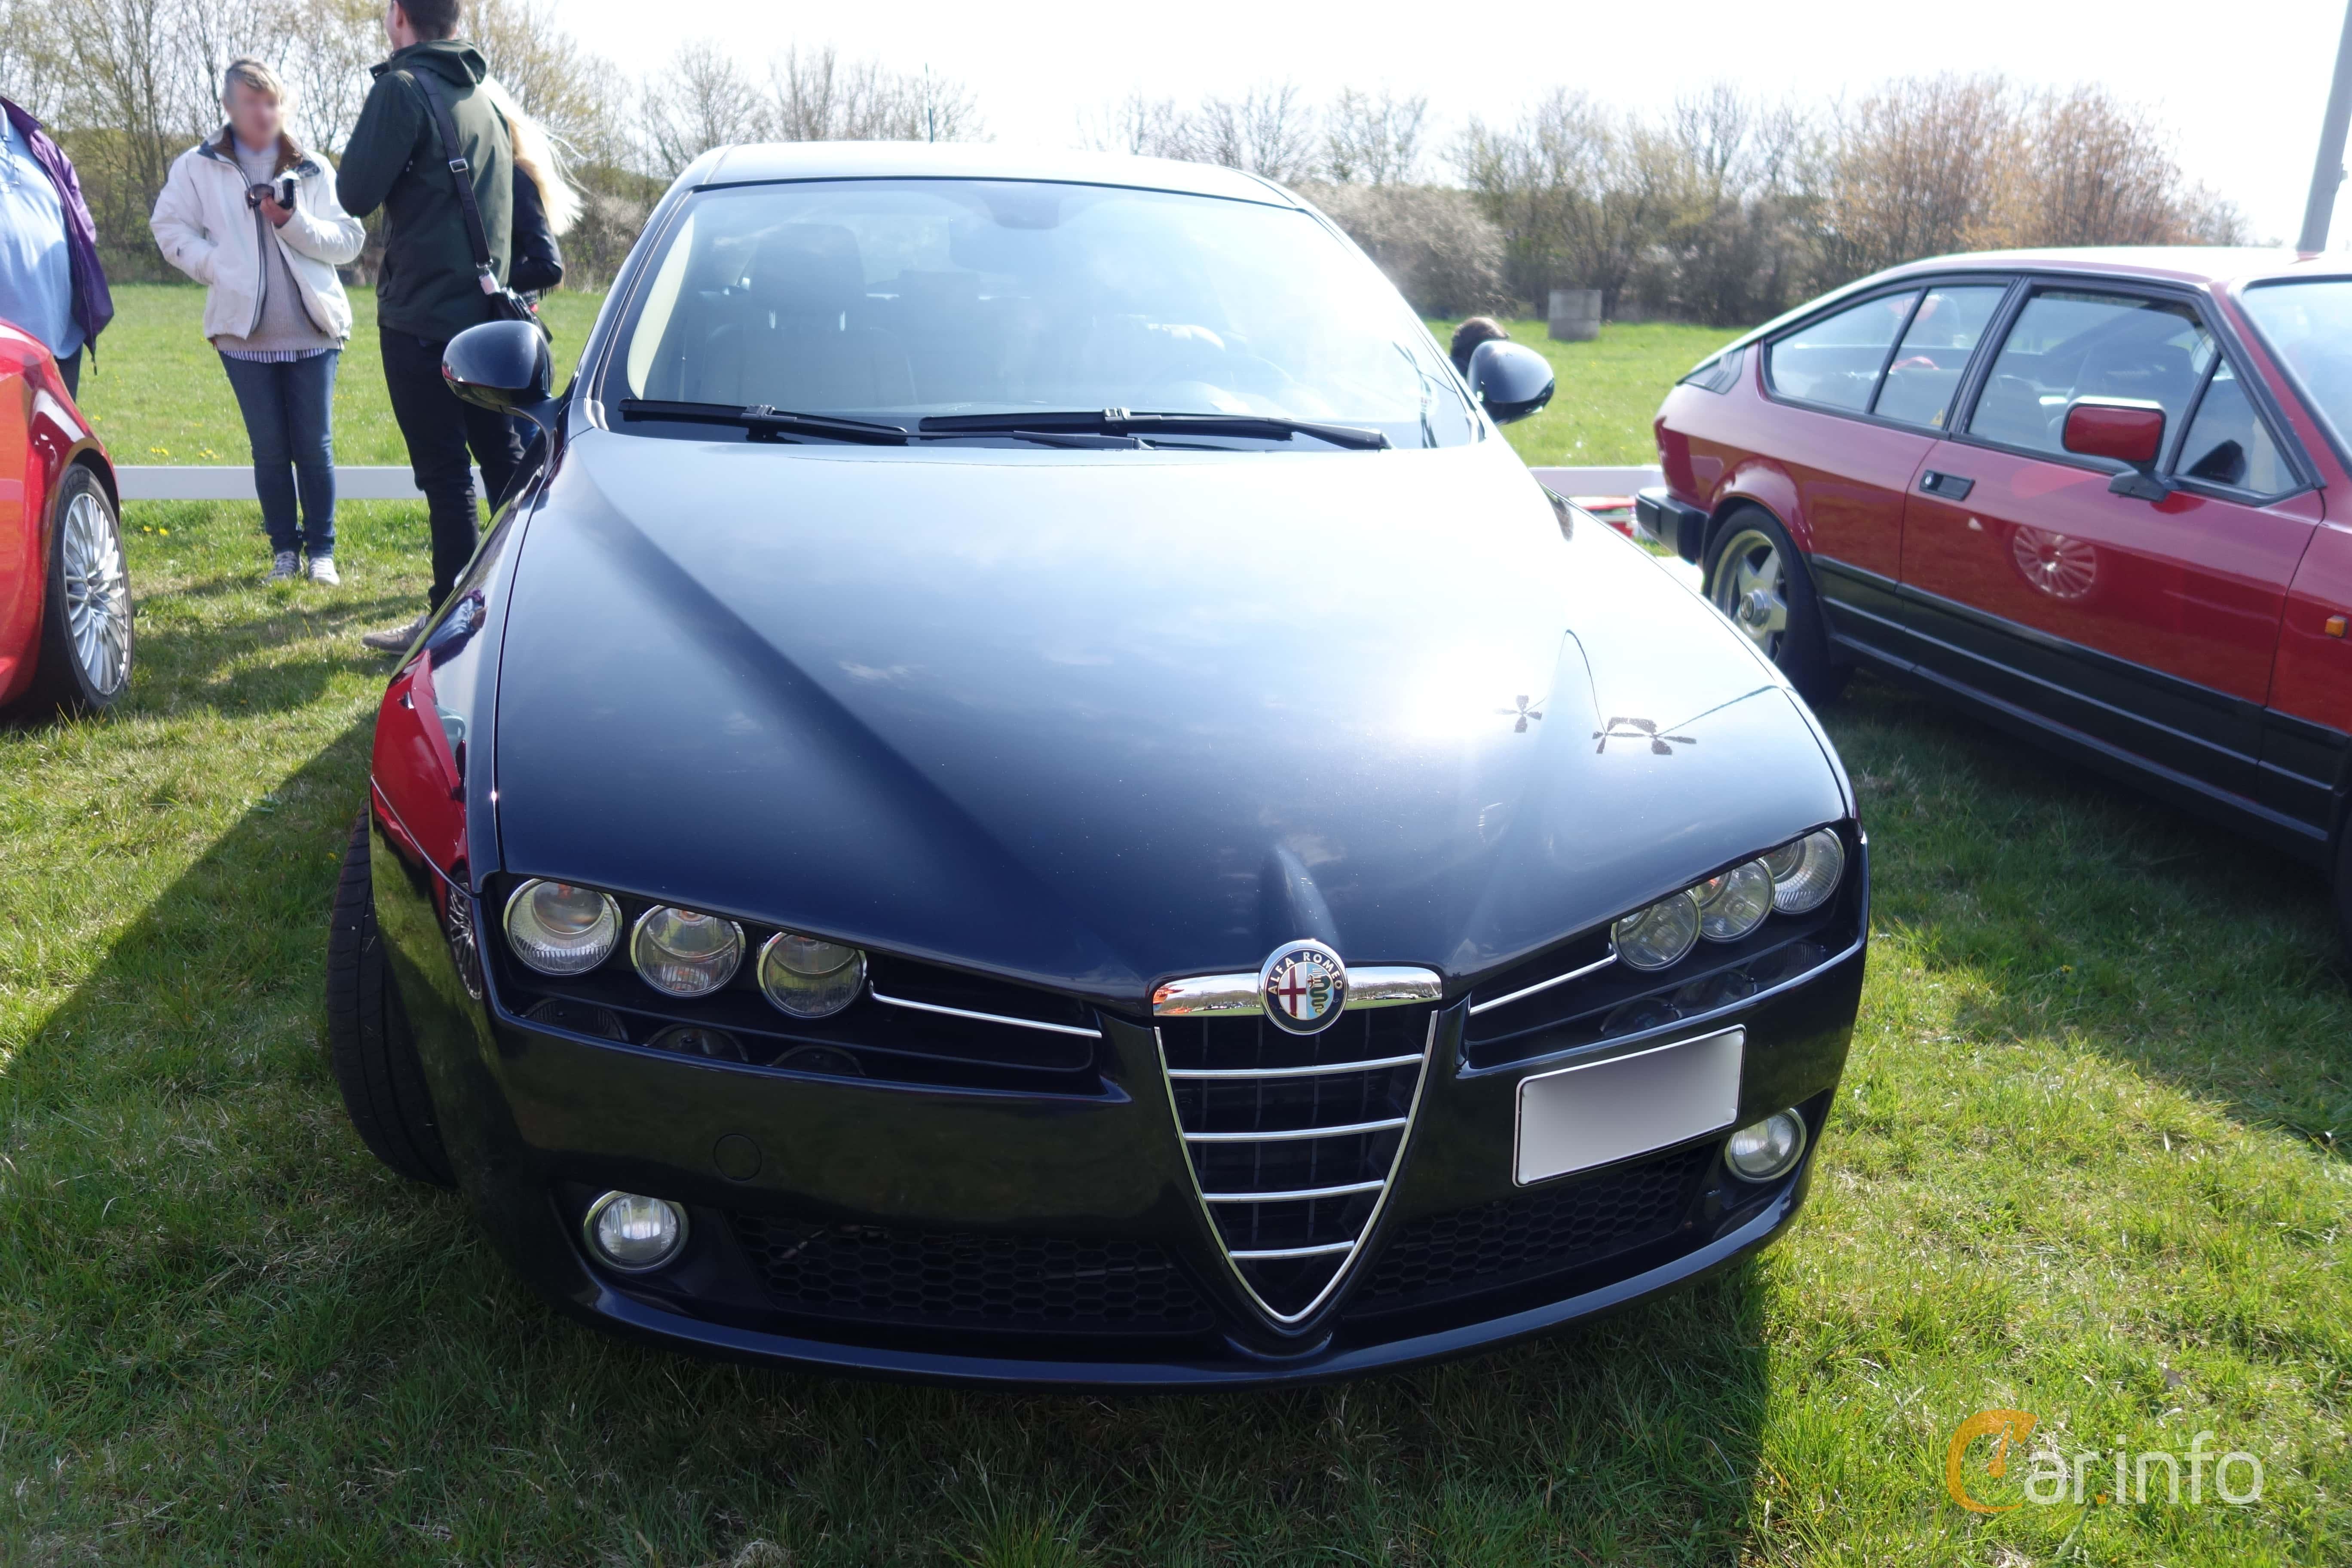 4 images of Alfa Romeo 159 Sportwagon 1.9 JTDM 16V Q Tronic